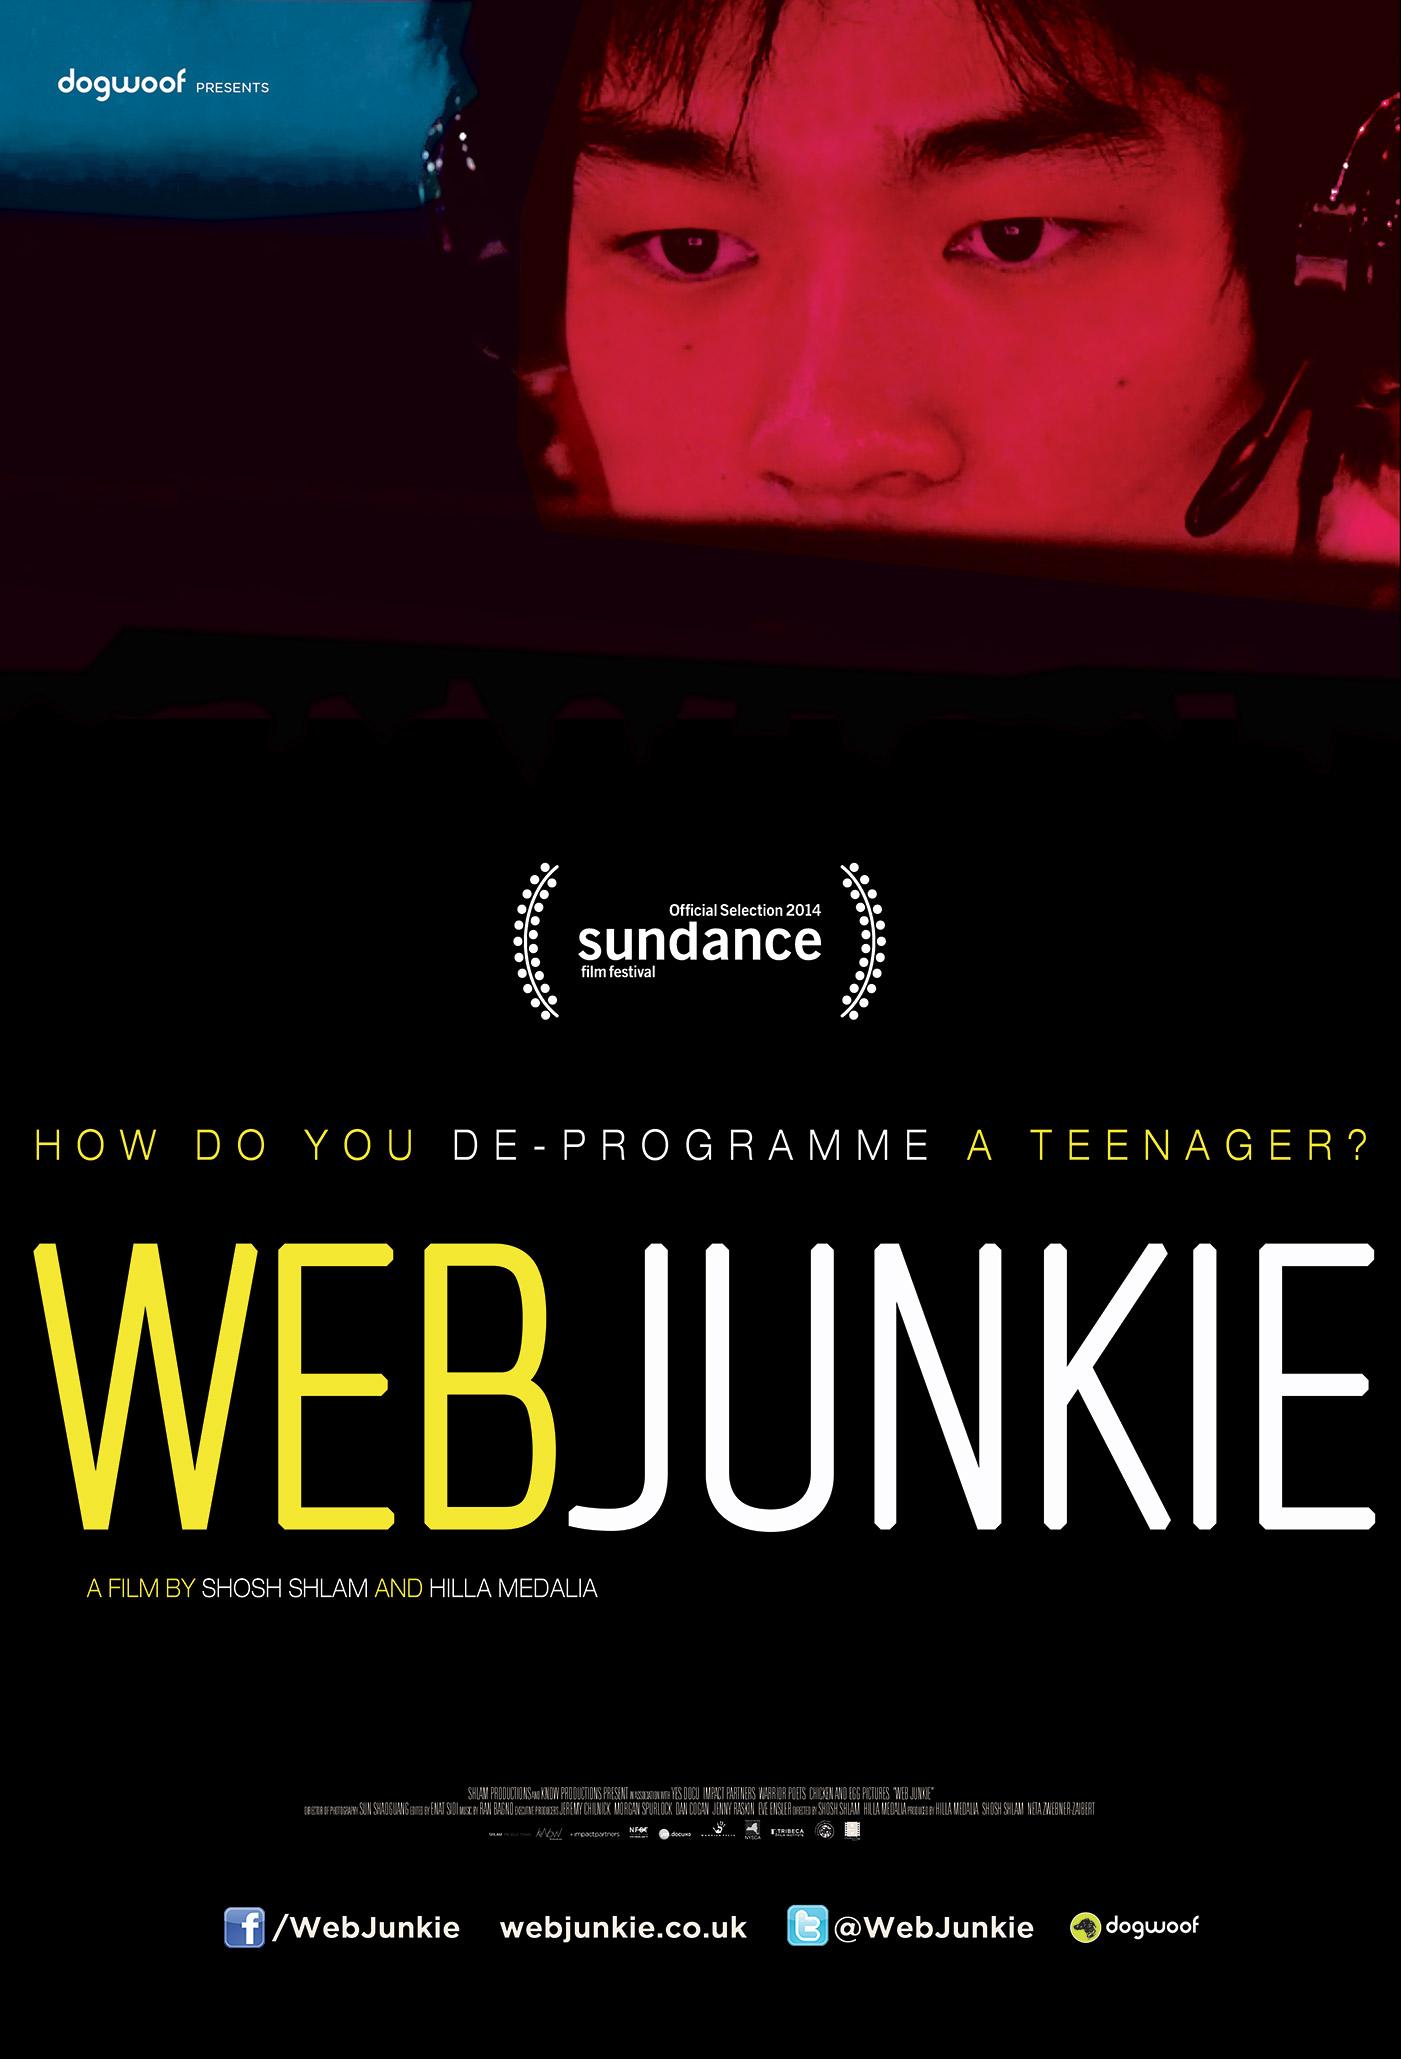 Web Junkie Shosh Shlam and Hilla Mendalia